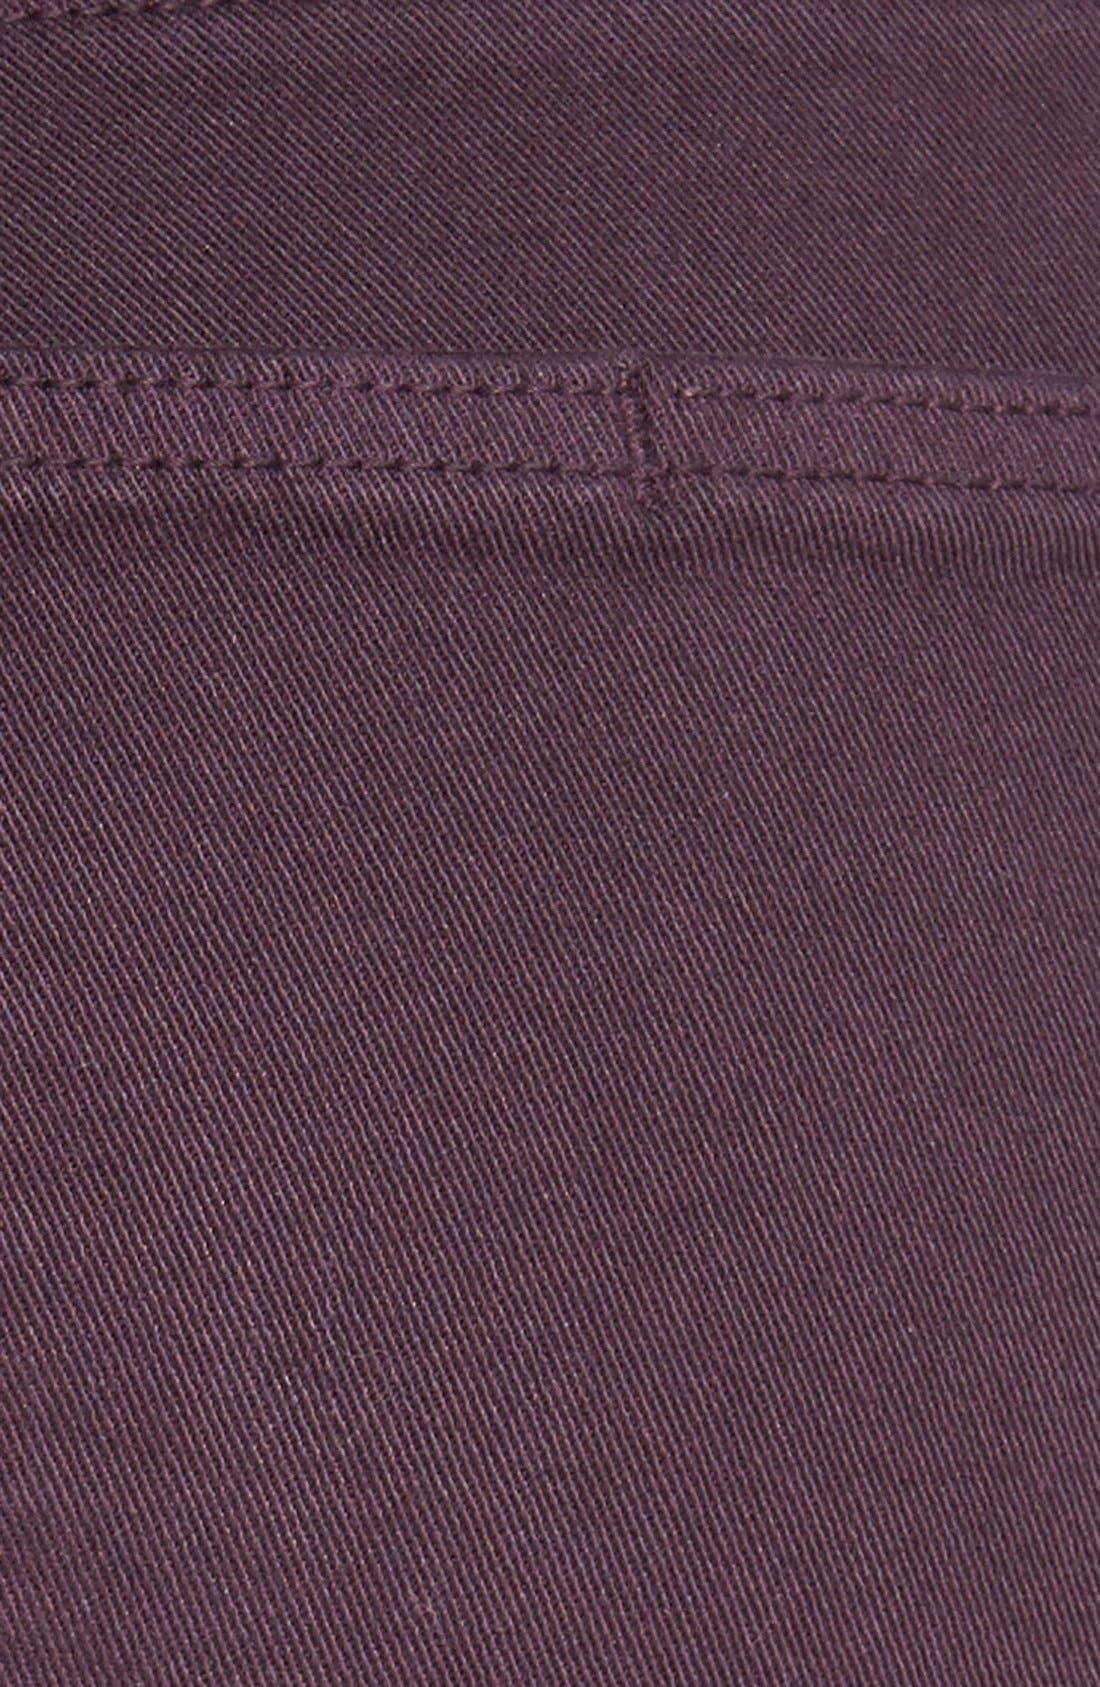 Alternate Image 7  - Paige Denim 'Verdugo' Ankle Skinny Jeans (Autumn Plum) (Nordstrom Exclusive)